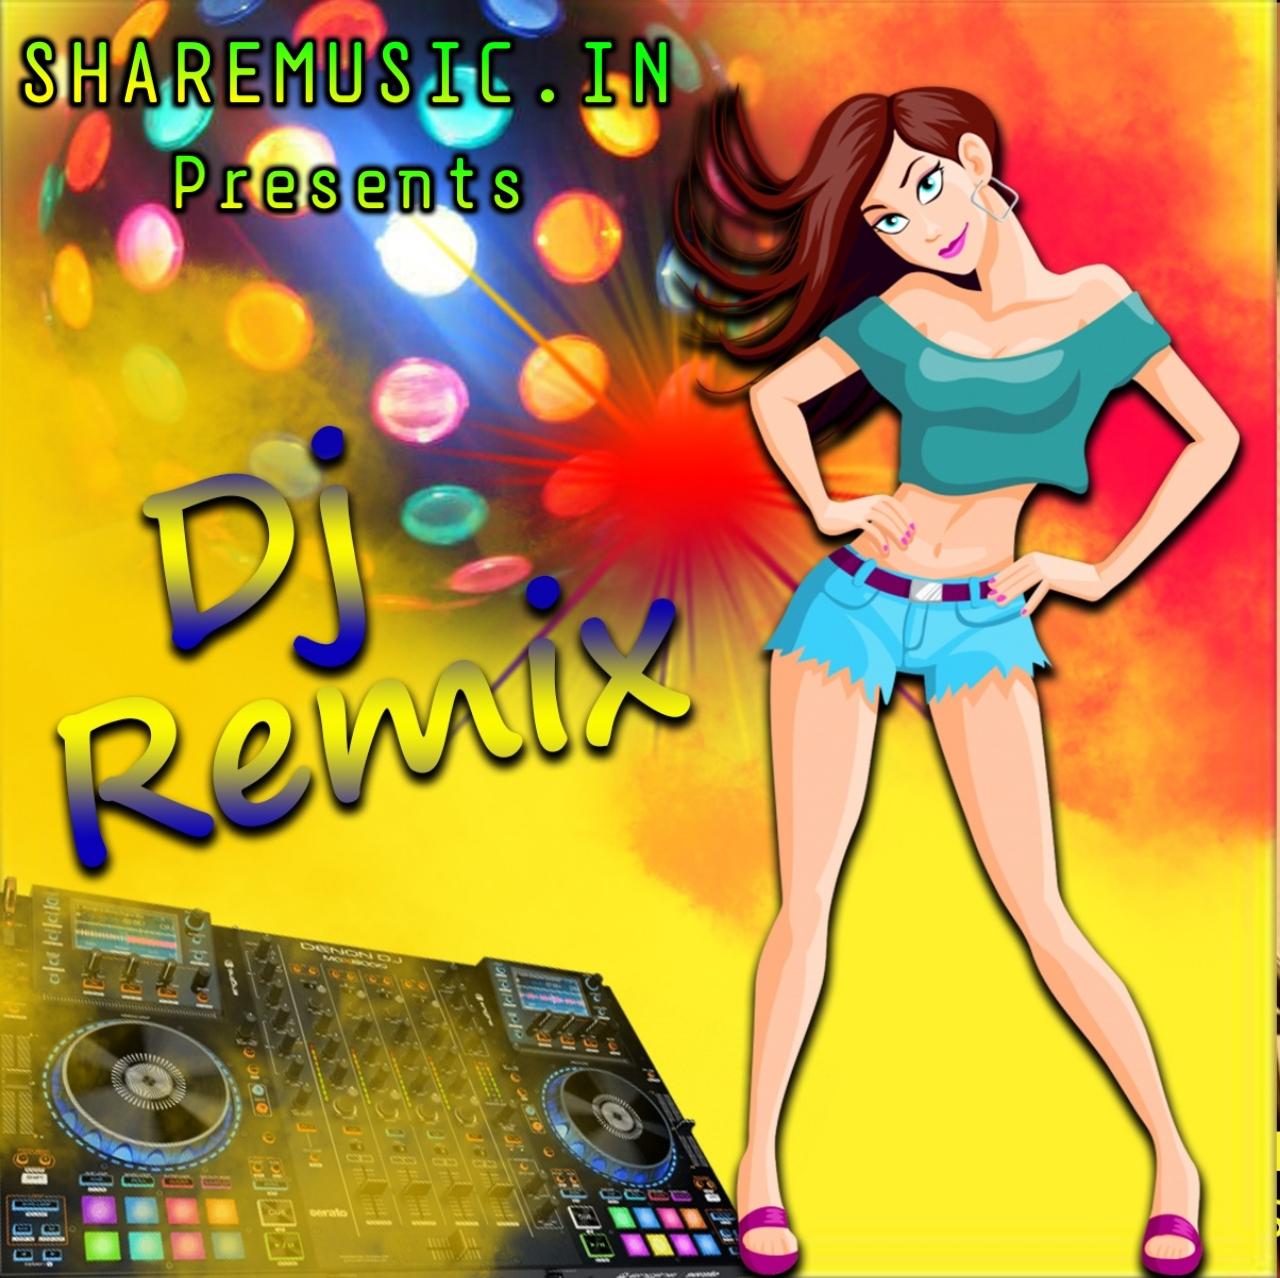 KESHARI LO (DYNAMITE EDM) DJ AR OFFICIAL (ABHINASH RAJ) BBSR